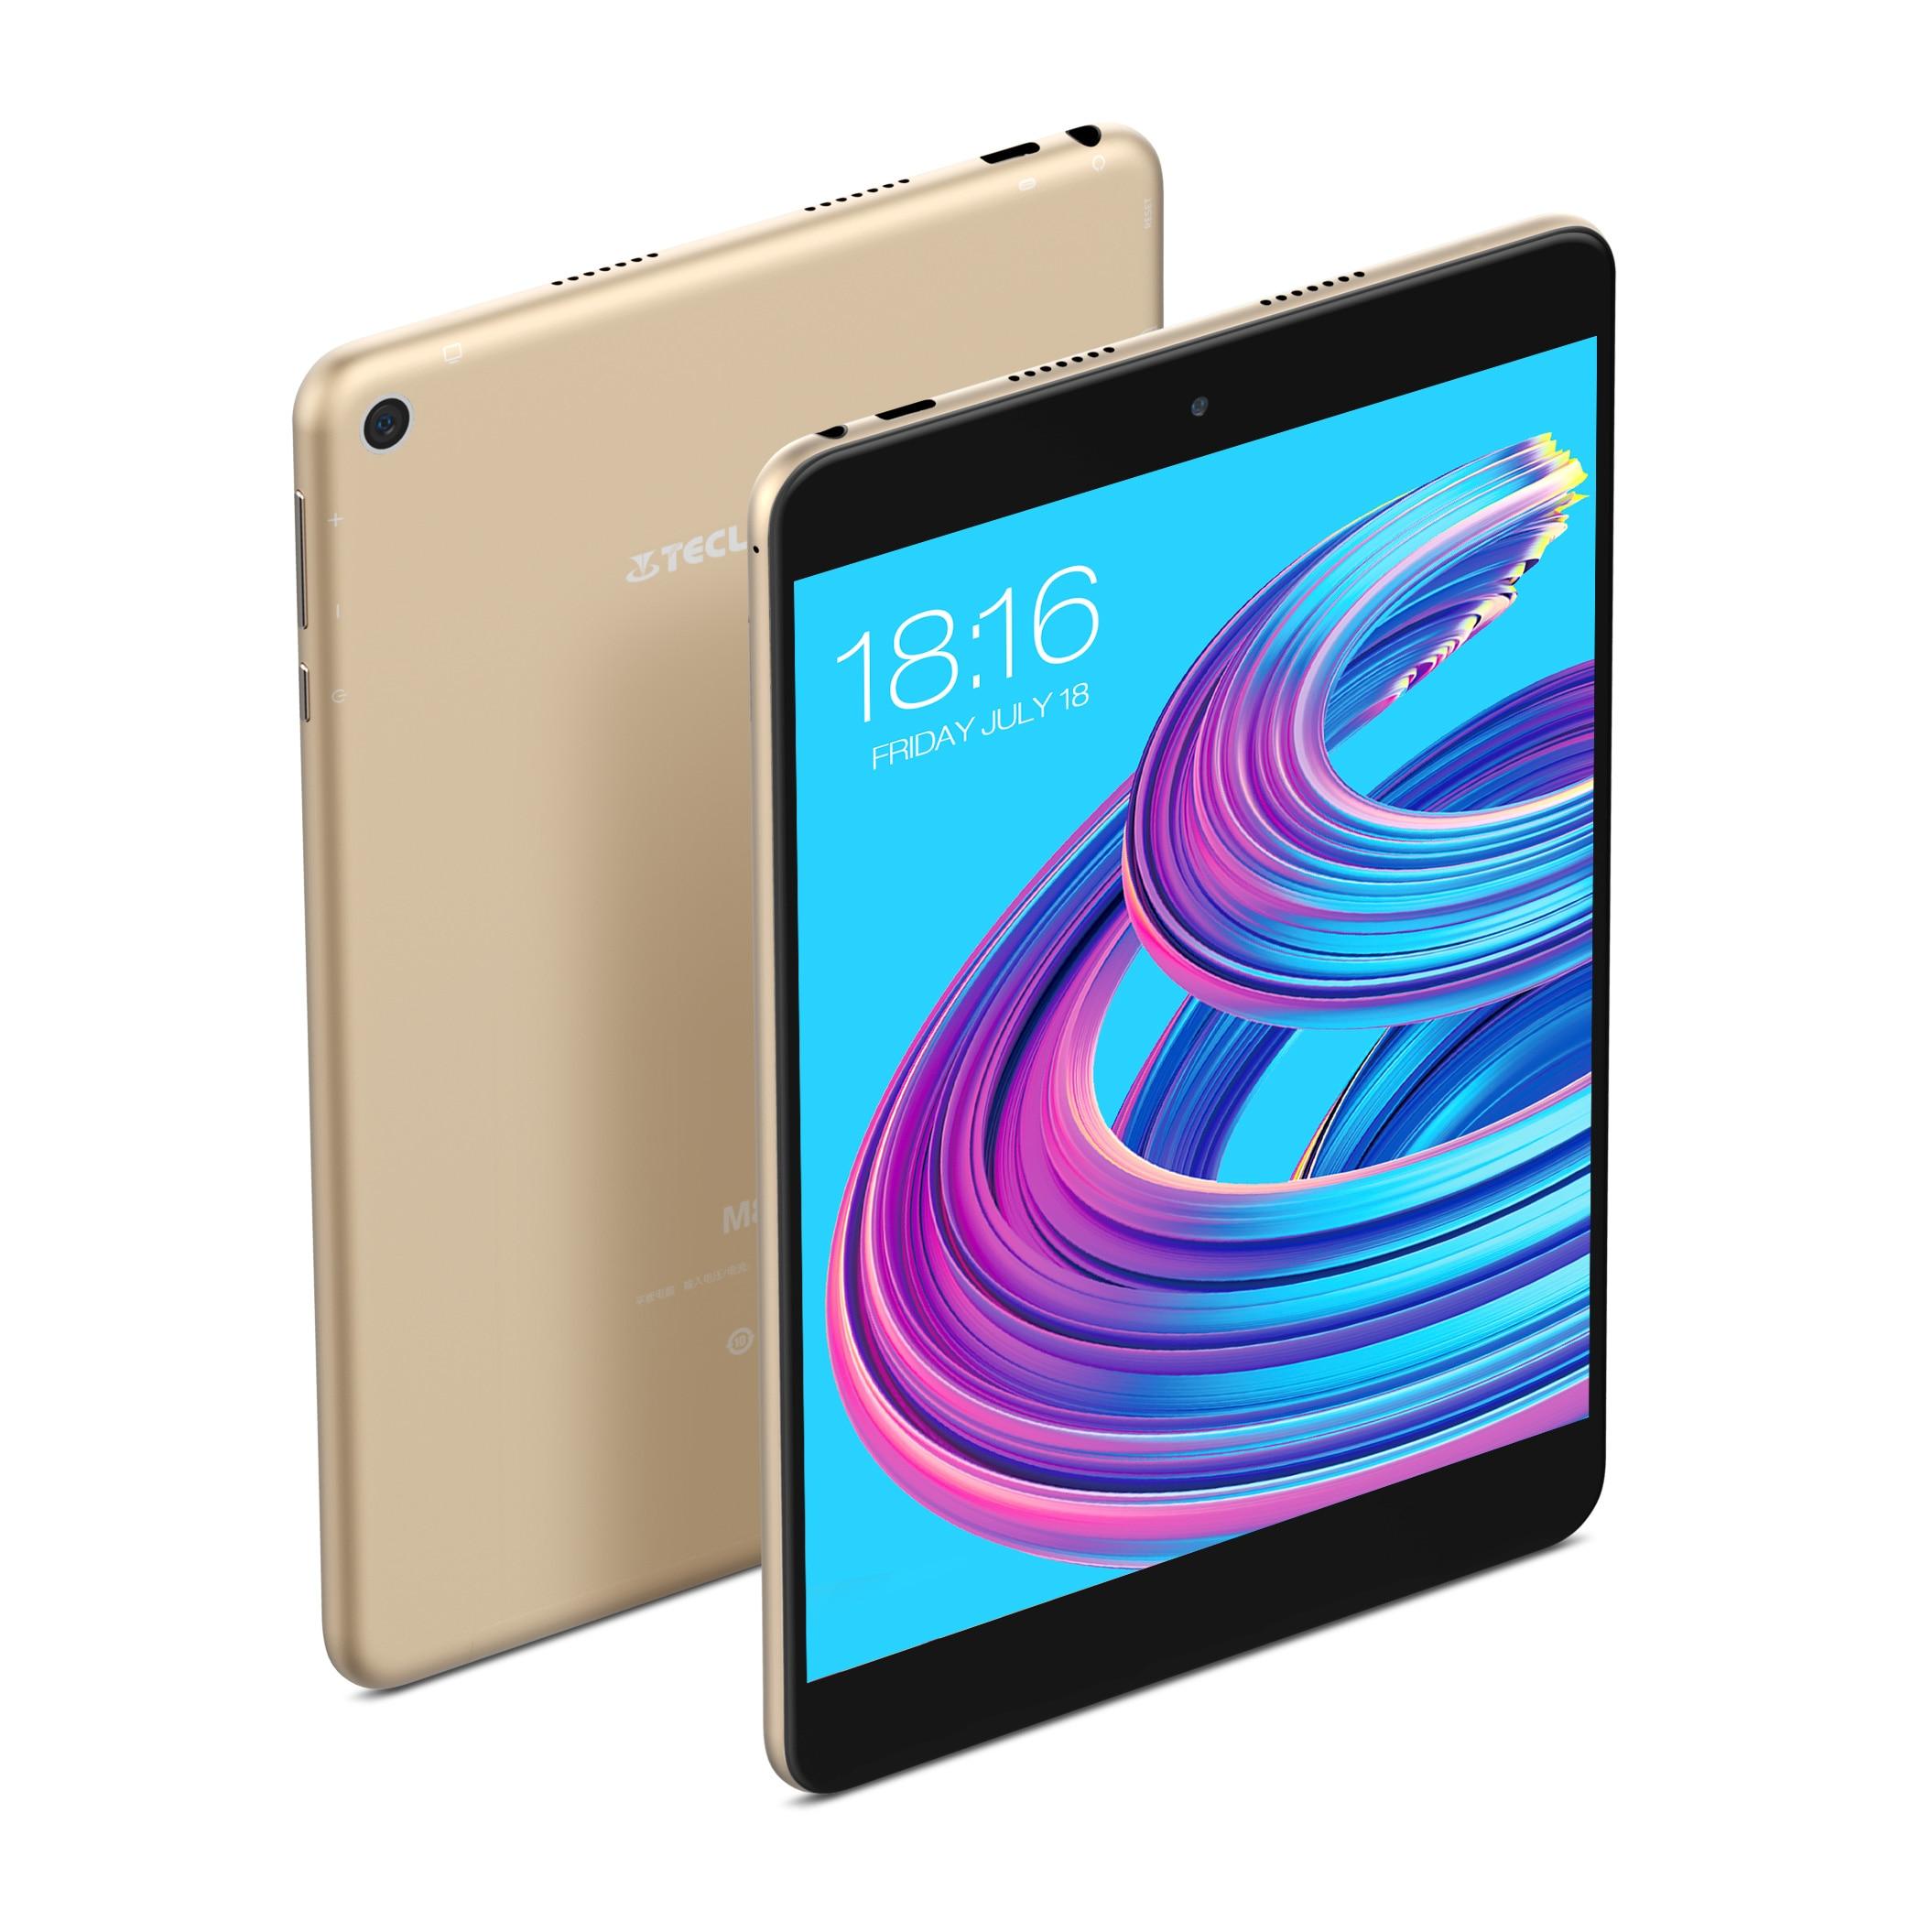 Teclast M89 Pro IPS 7.9 Inch 2048×1536 Tablet PC 3GB RAM 32GB ROM 10 Core MTK8176 Type-C Dual Cameras WiFi Metal Brand 4500mAh